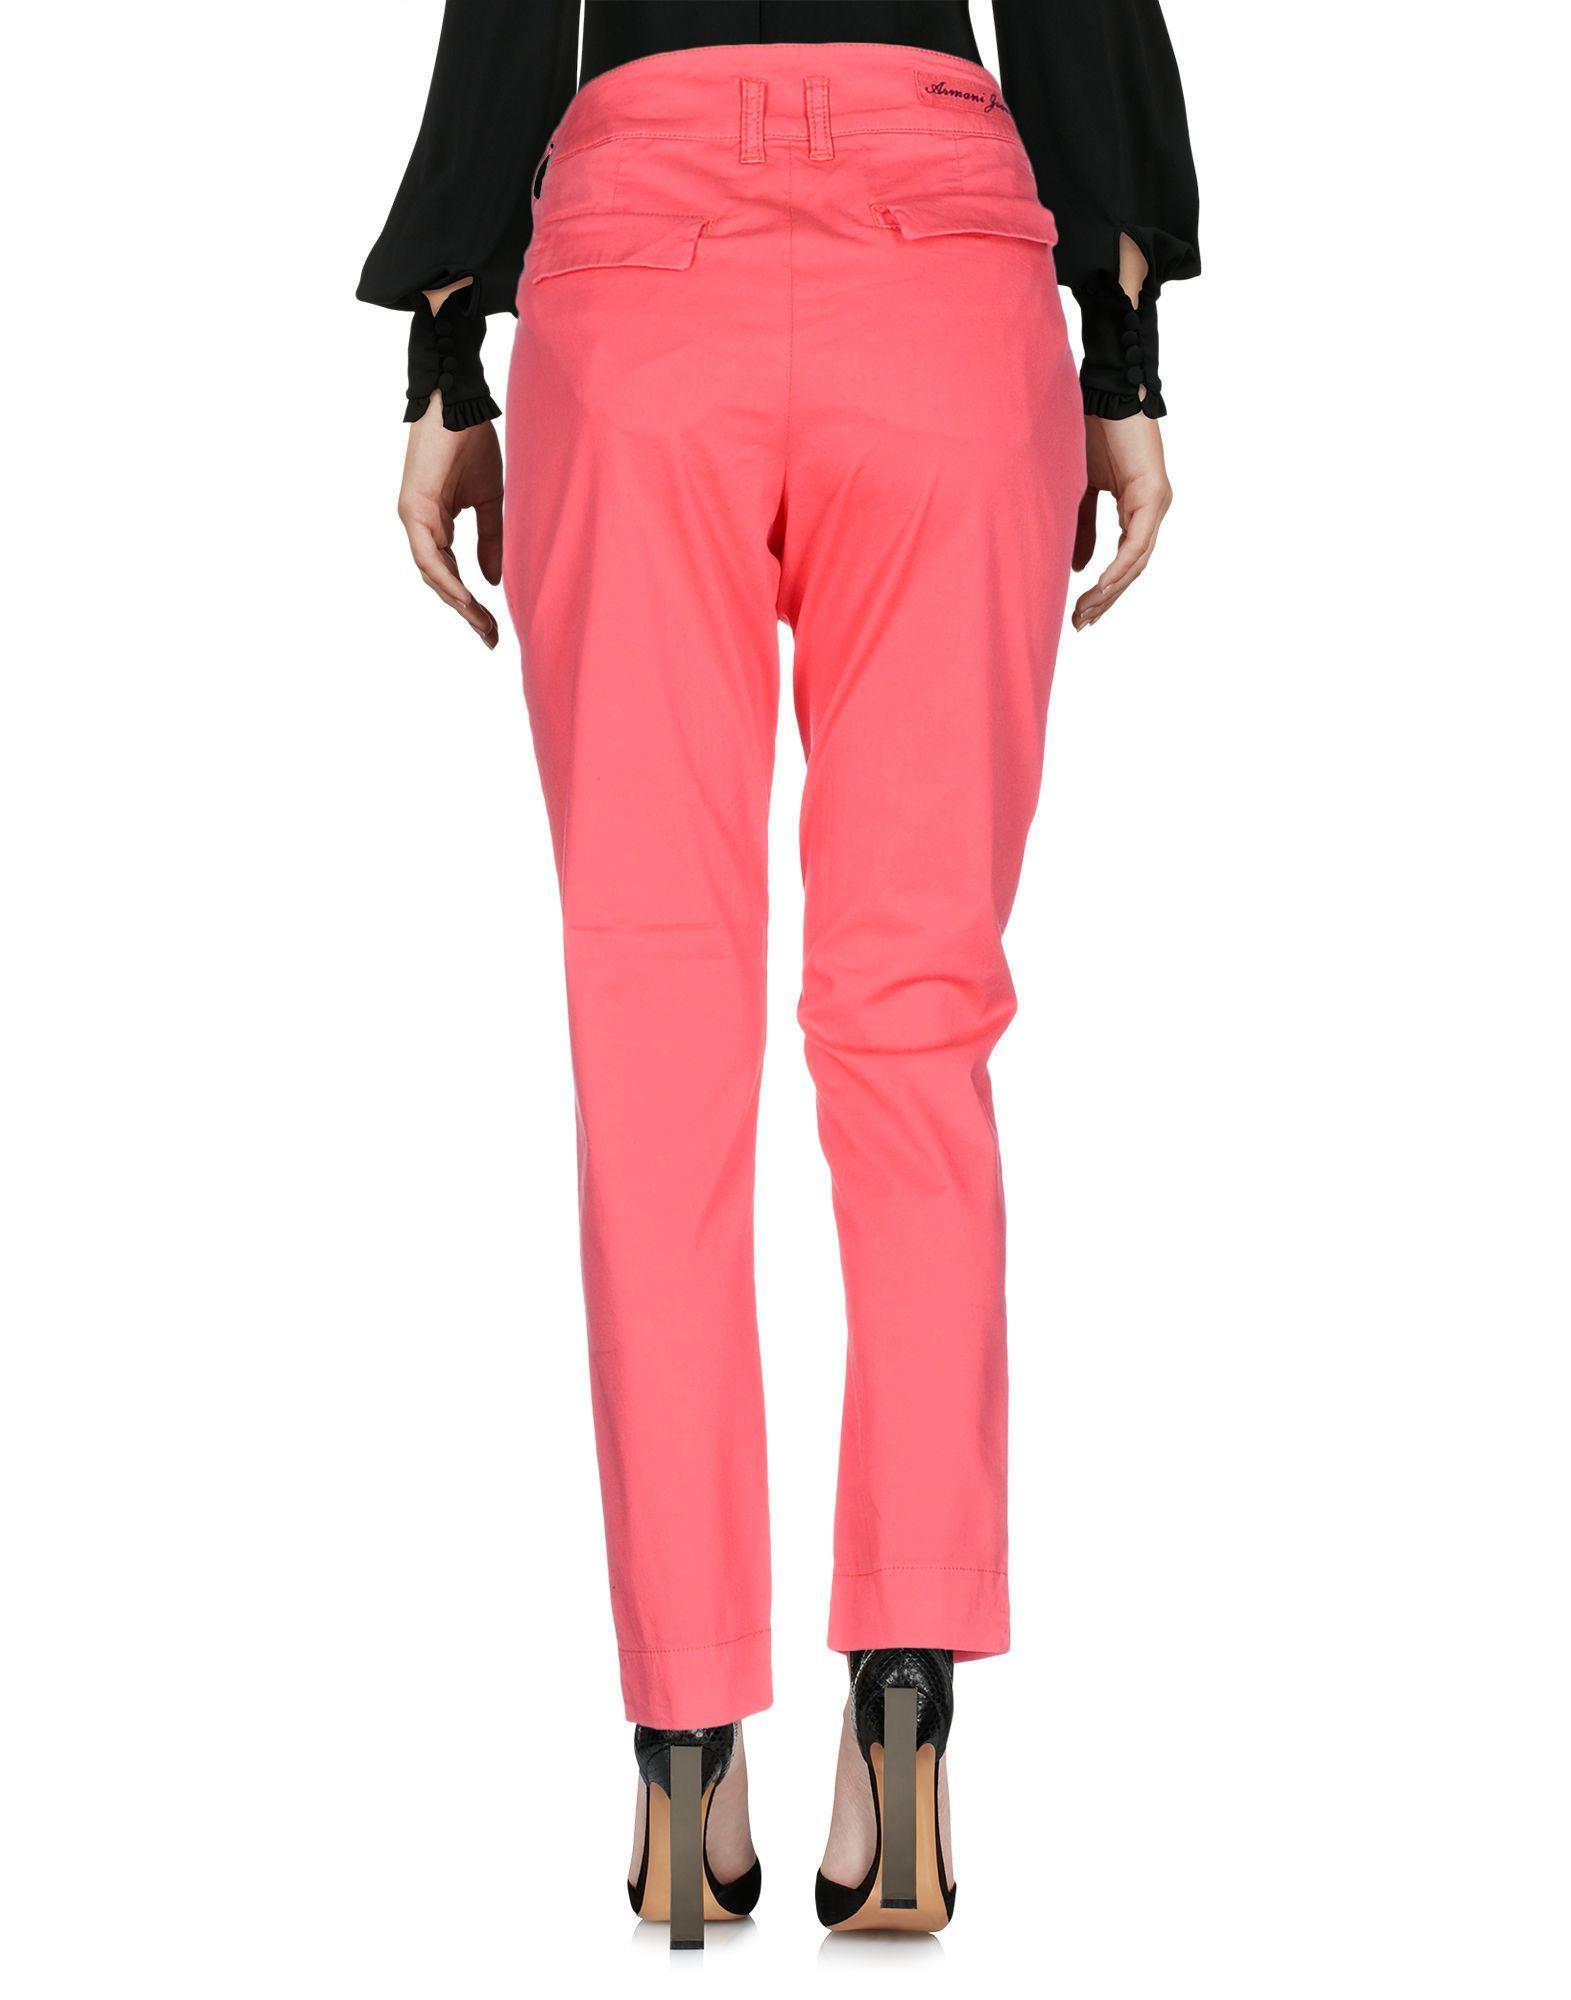 Armani Jeans Coral Cotton Trousers